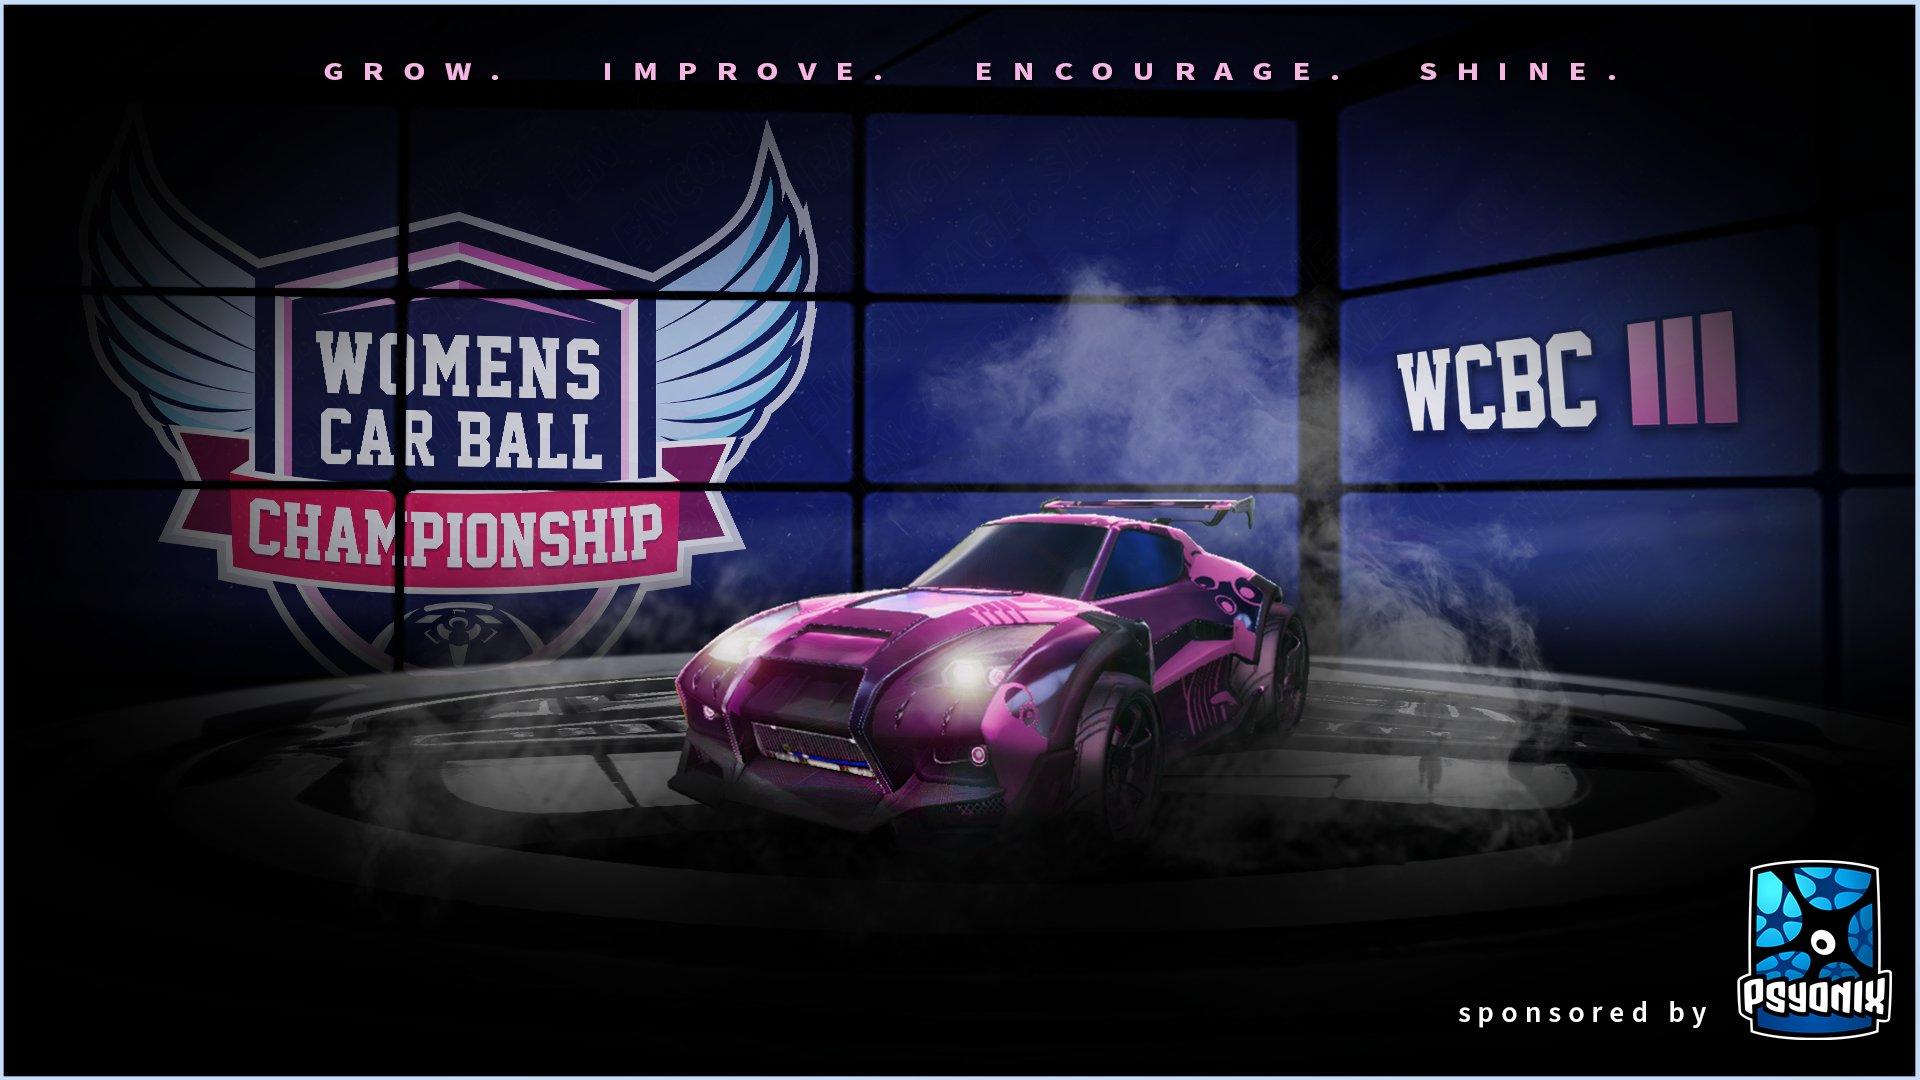 UK team catJAM win European Women's Car Ball Championship Season 3, tournament sparks debate on Twitter